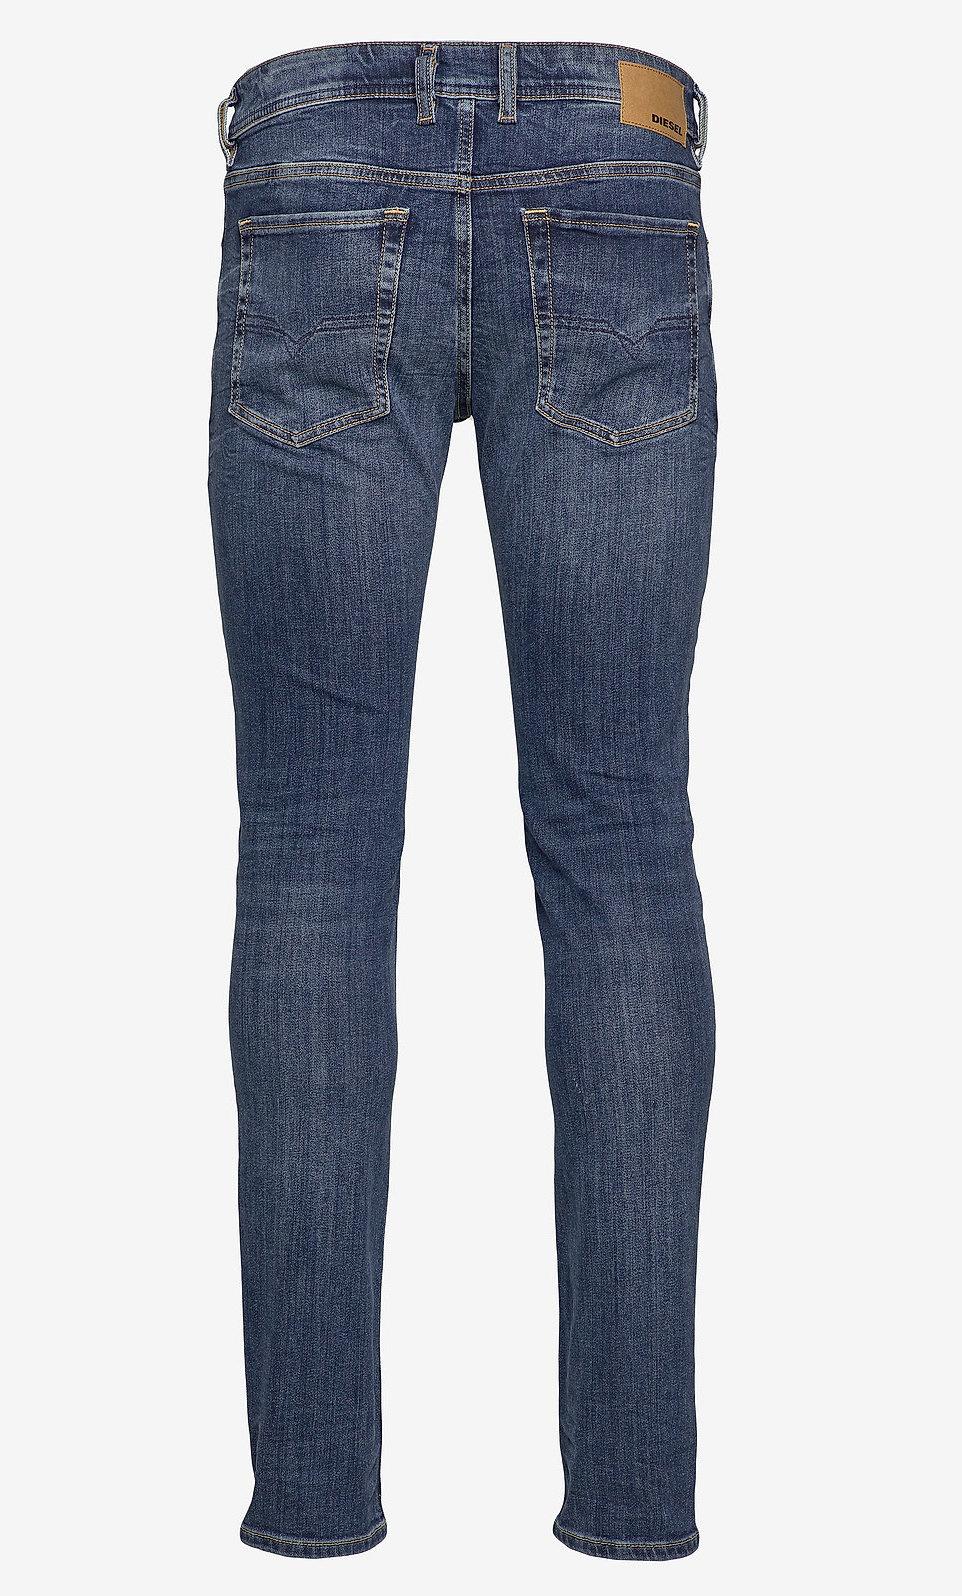 Diesel Tavares Slim fit Spijkerjeans, blauw